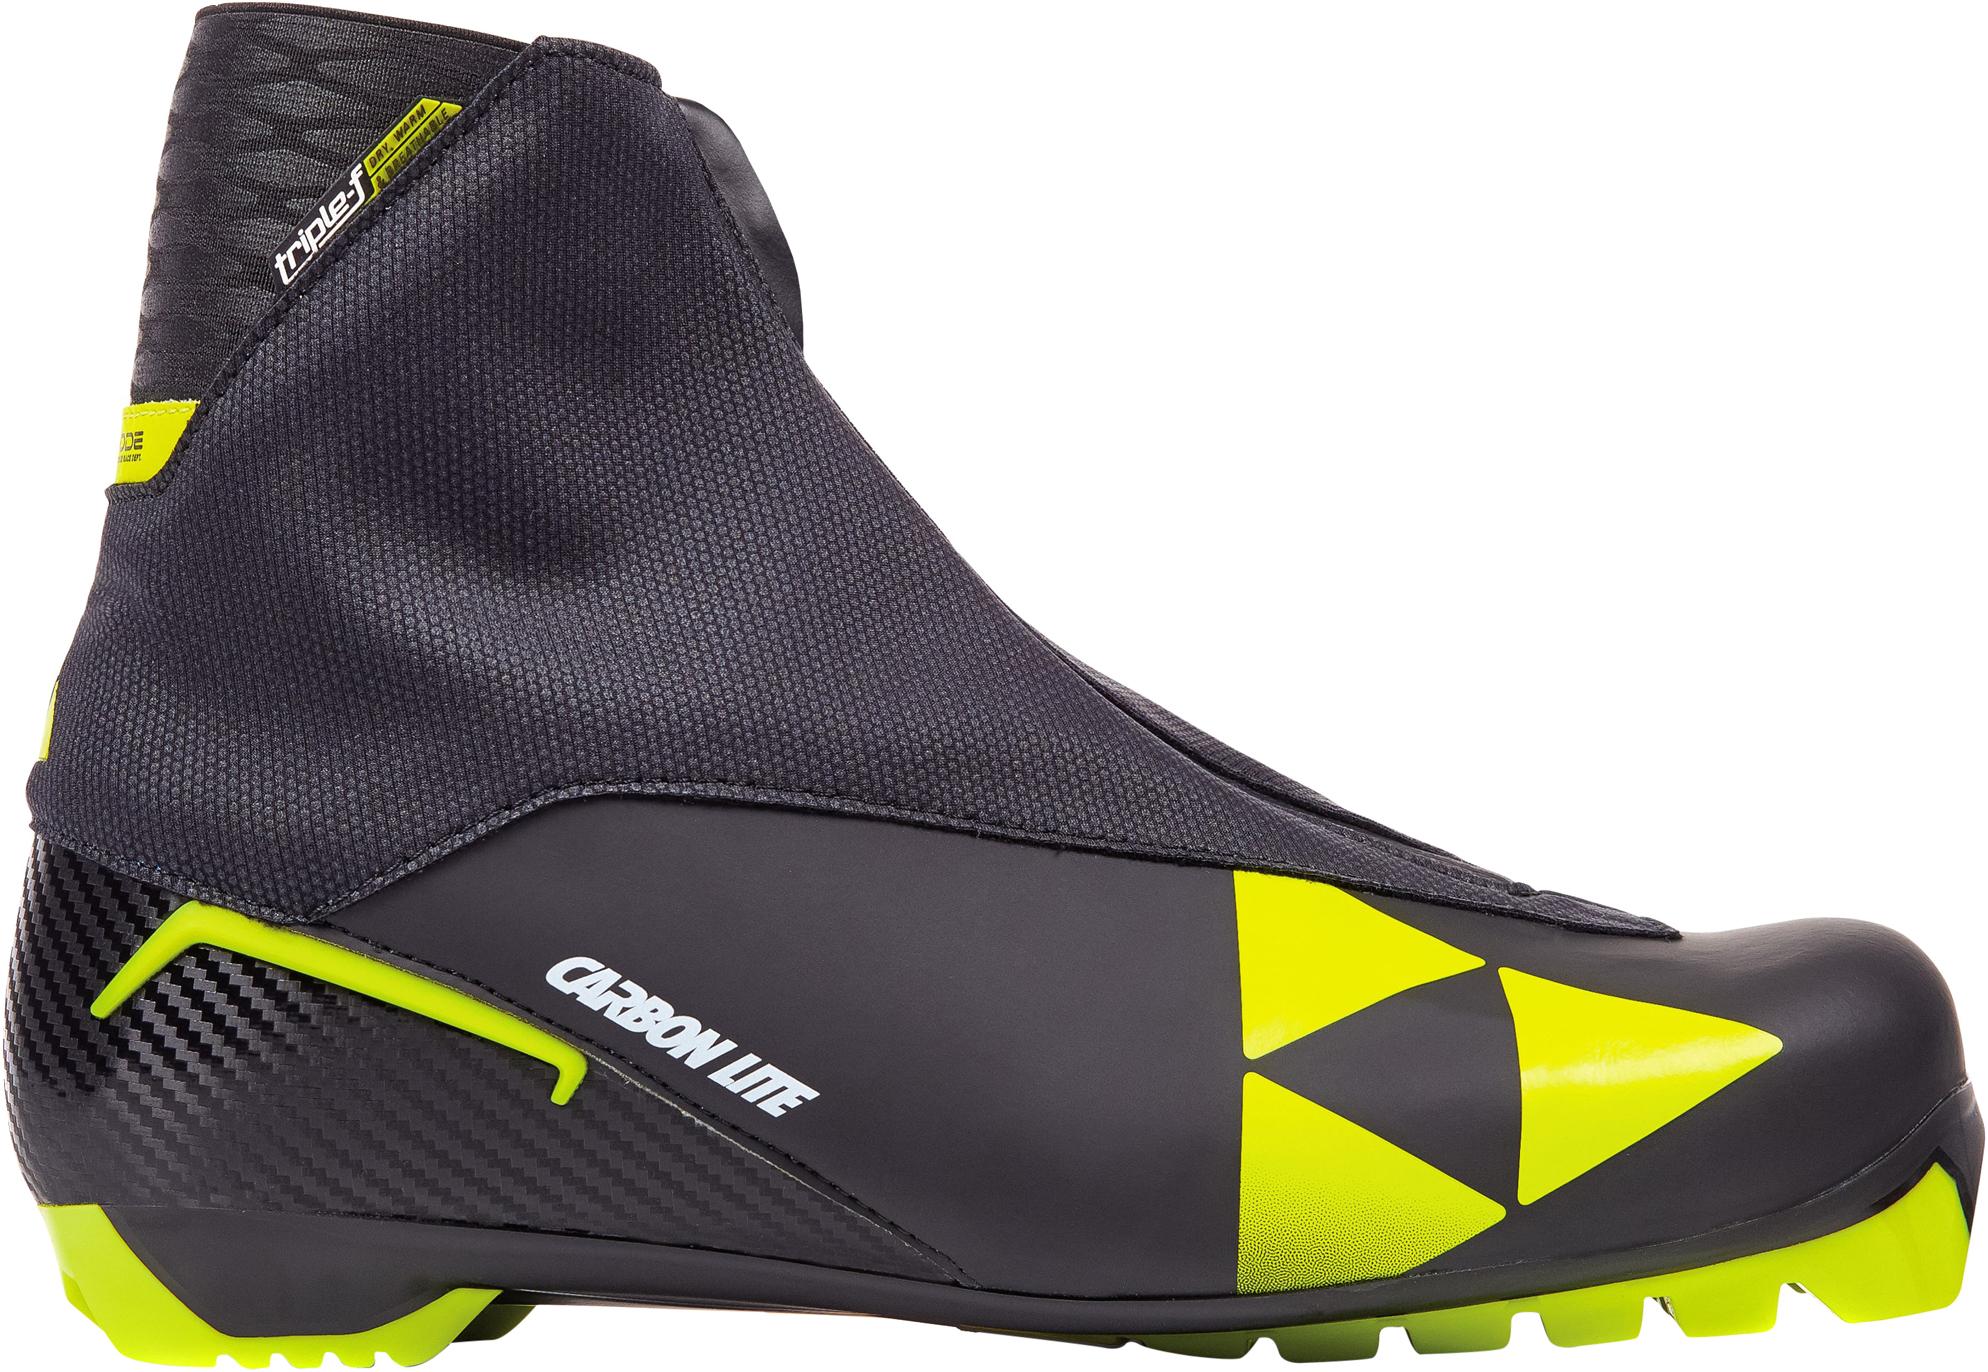 Fischer Ботинки для беговых лыж Carbonlite Classic